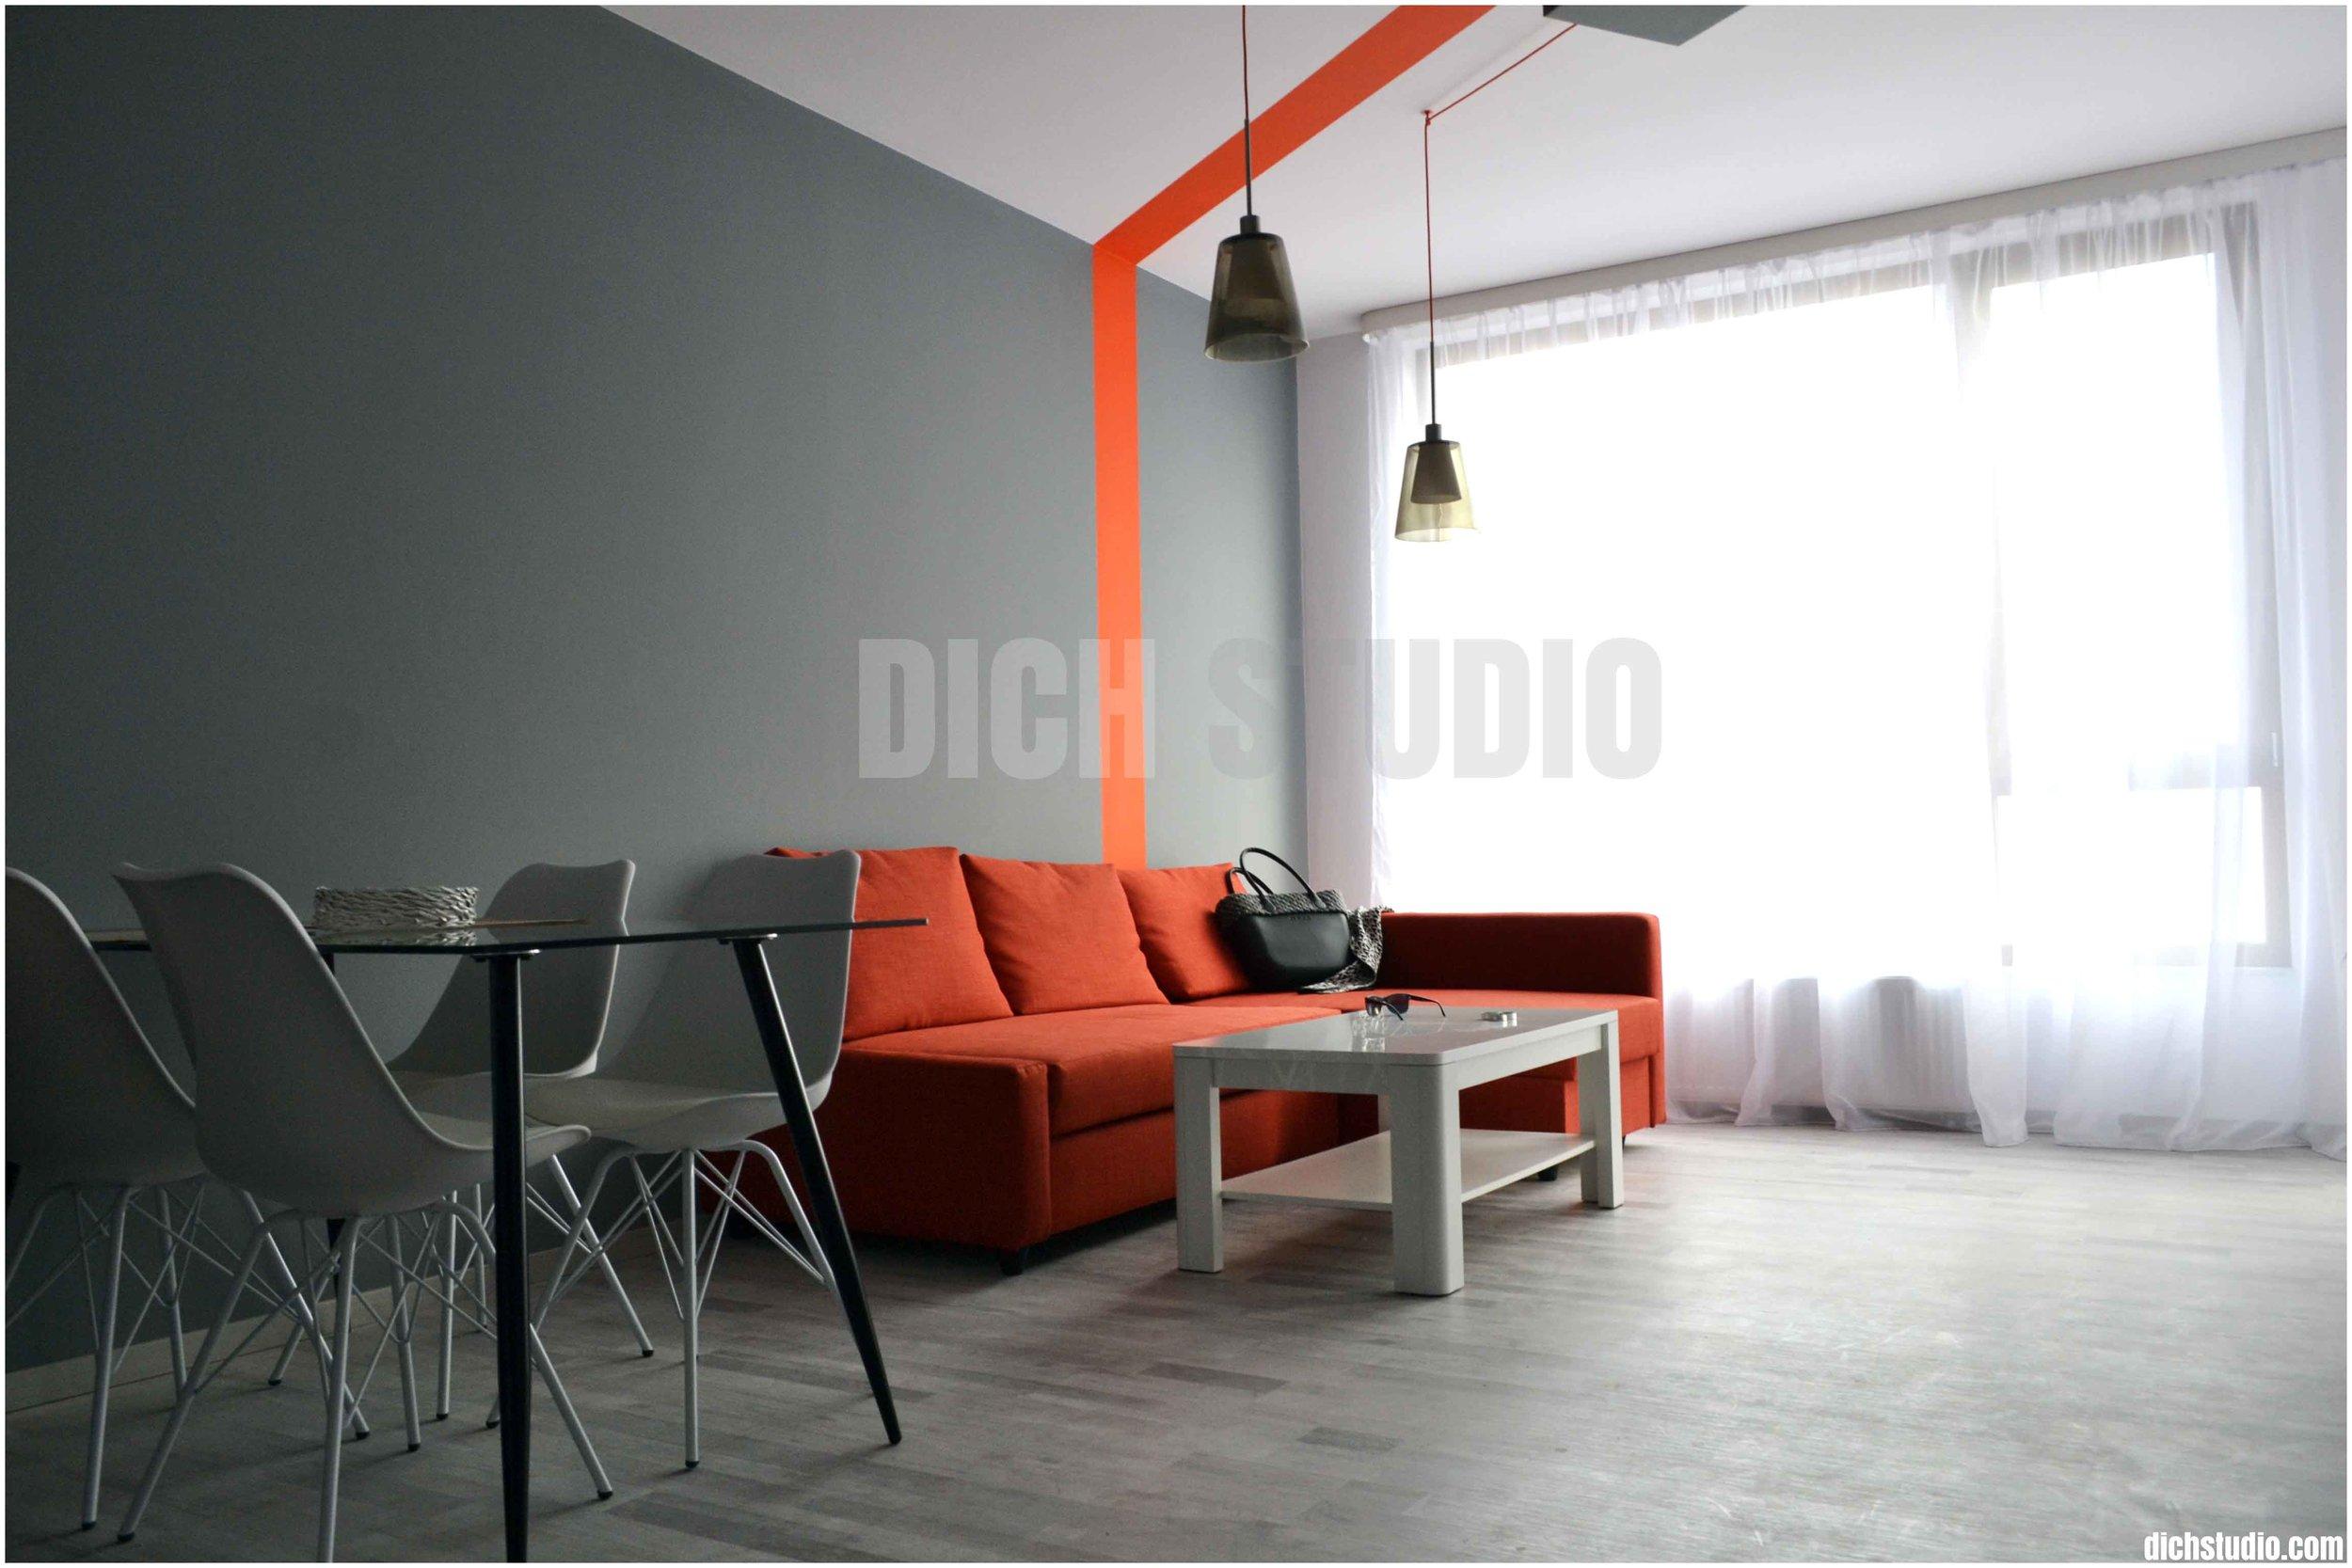 Completed work - interior design - living room detail